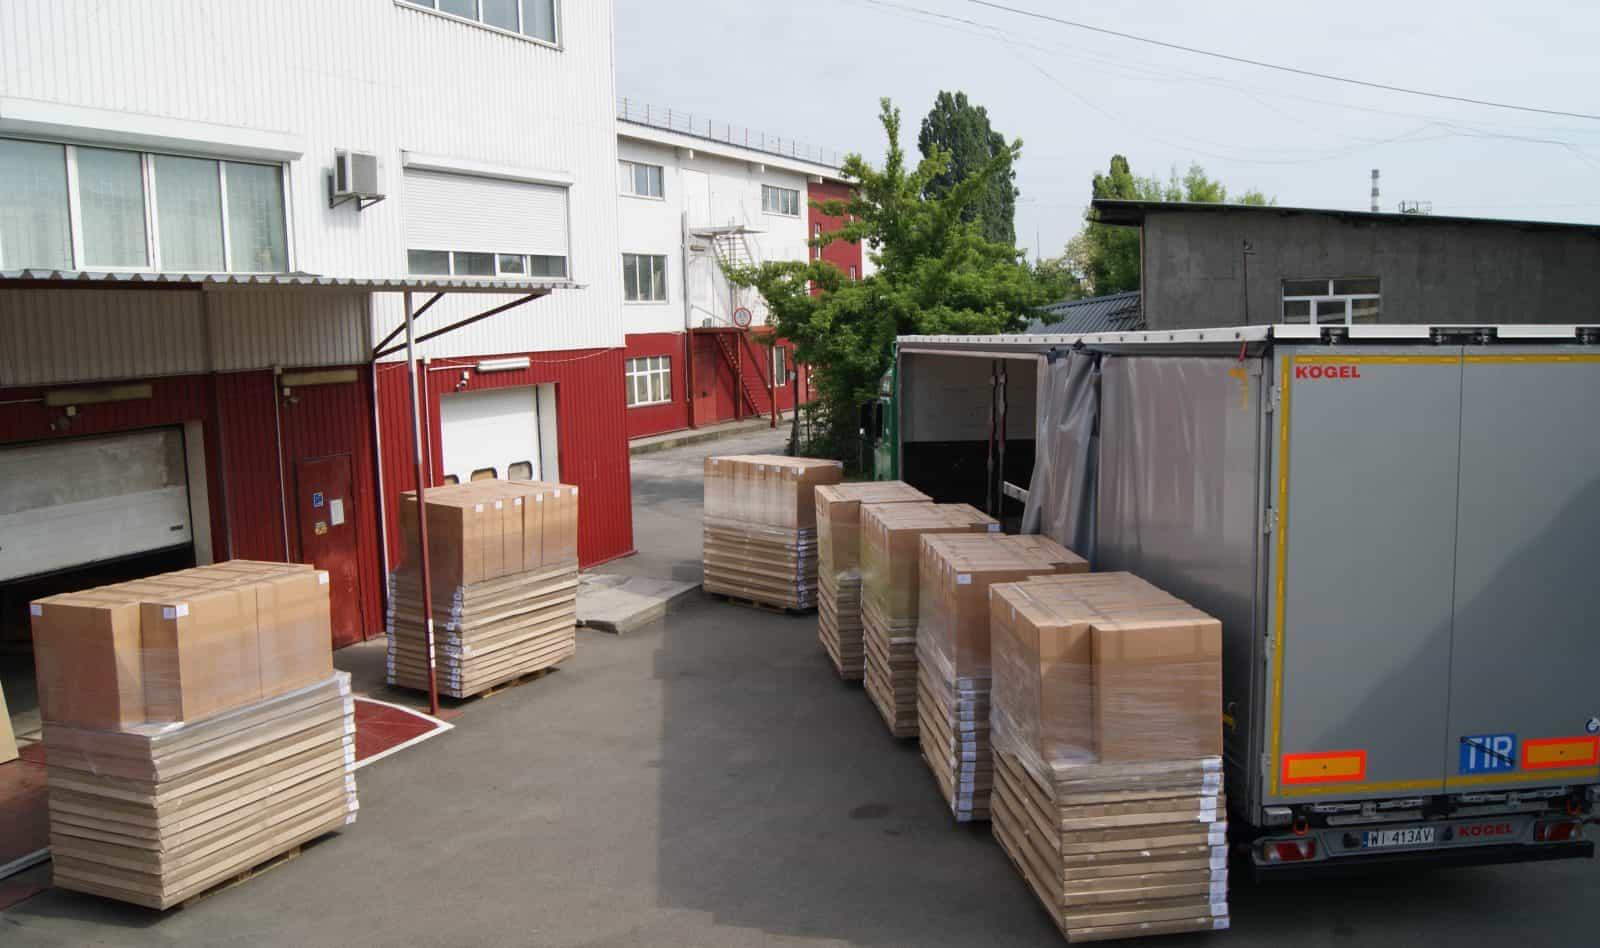 Transportmöbelfabrik